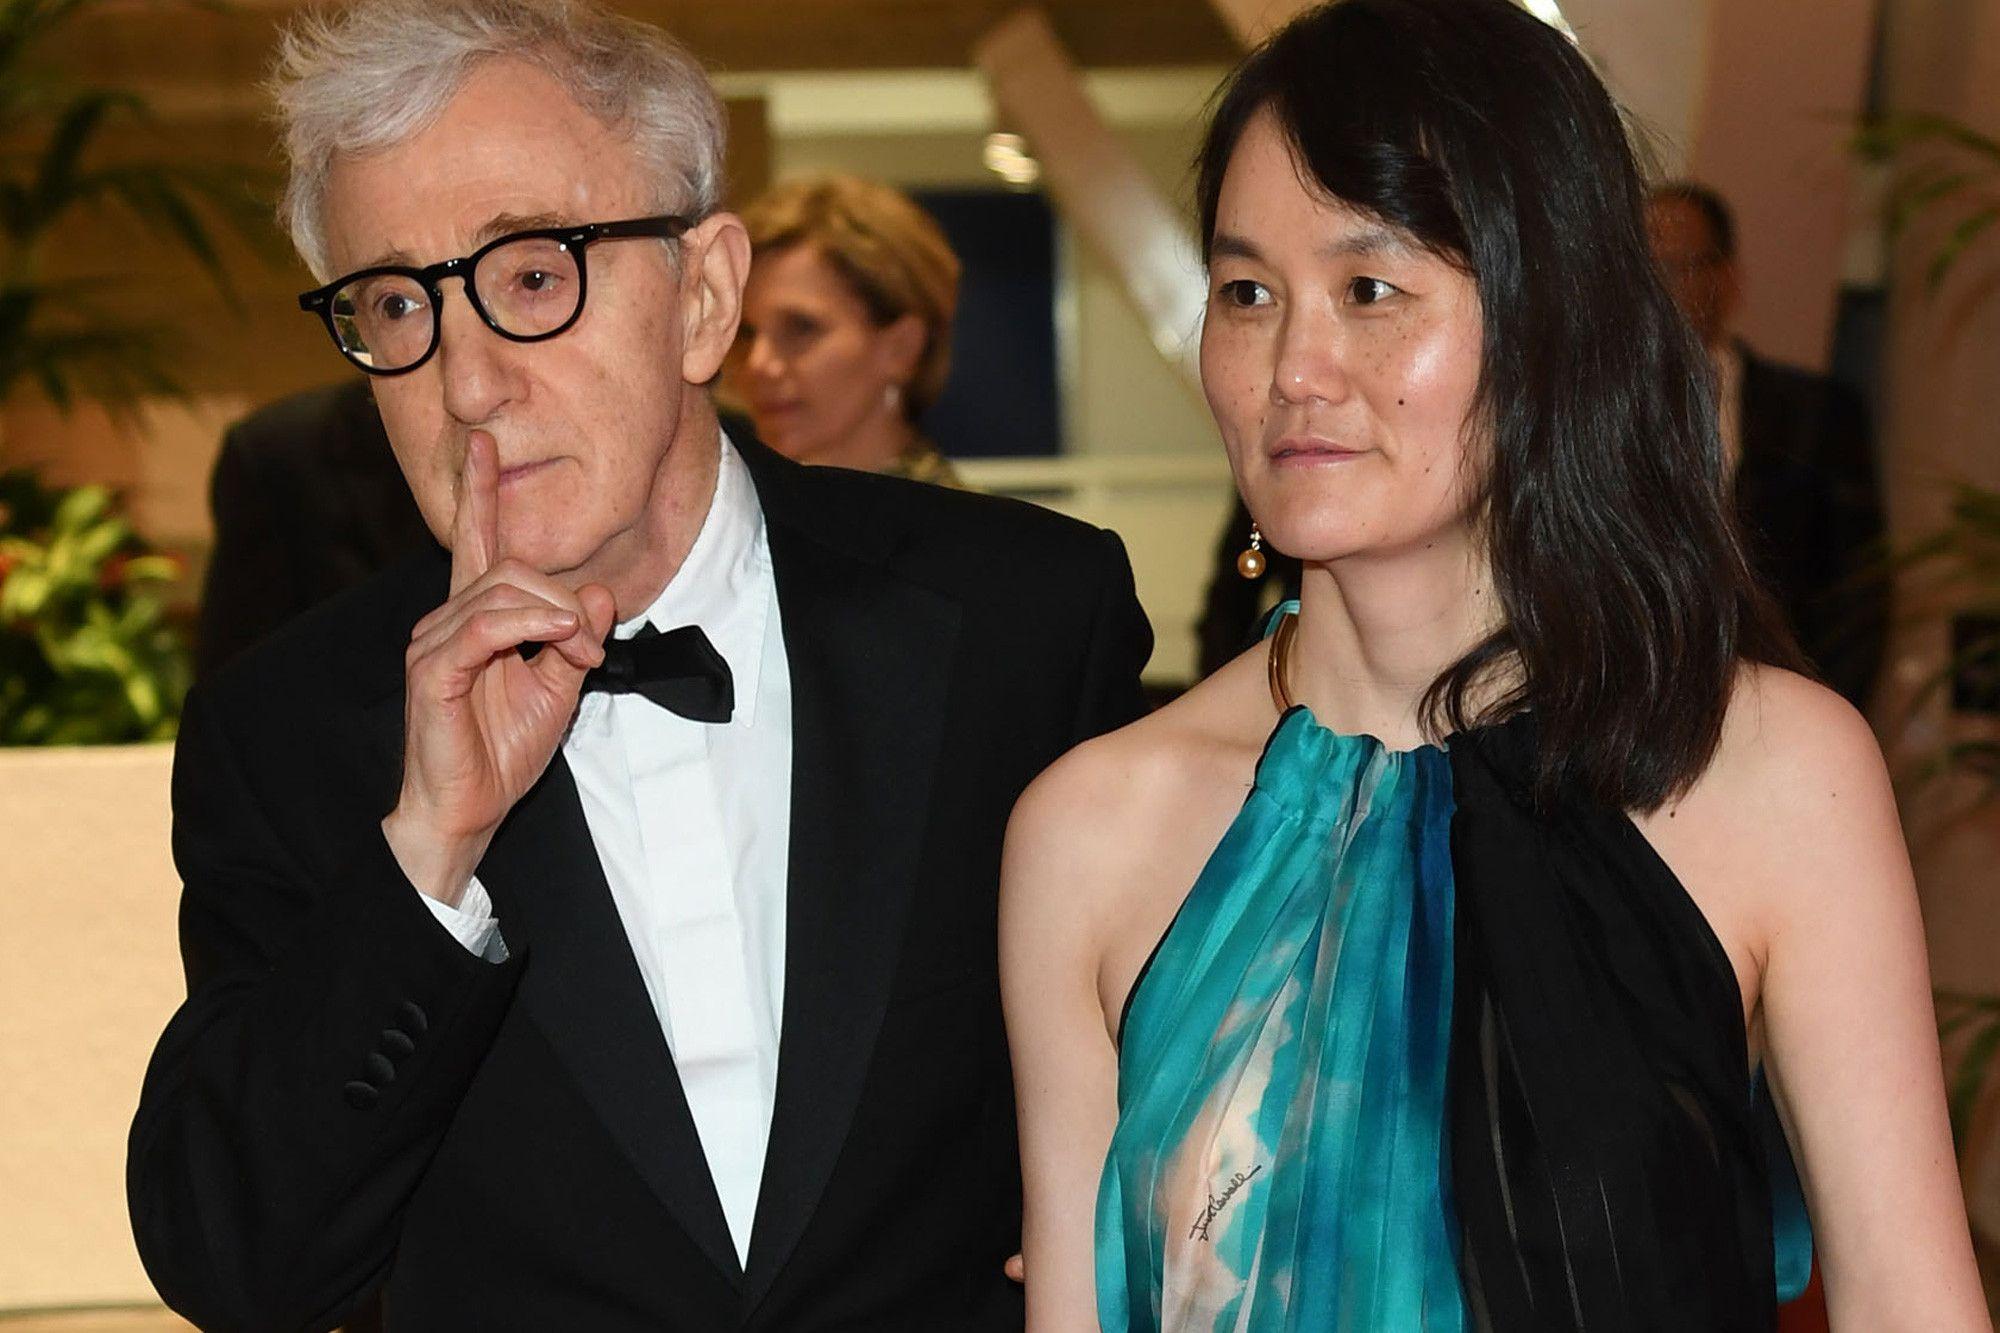 Woody Allen cant escape rape allegations at Cannes premiere